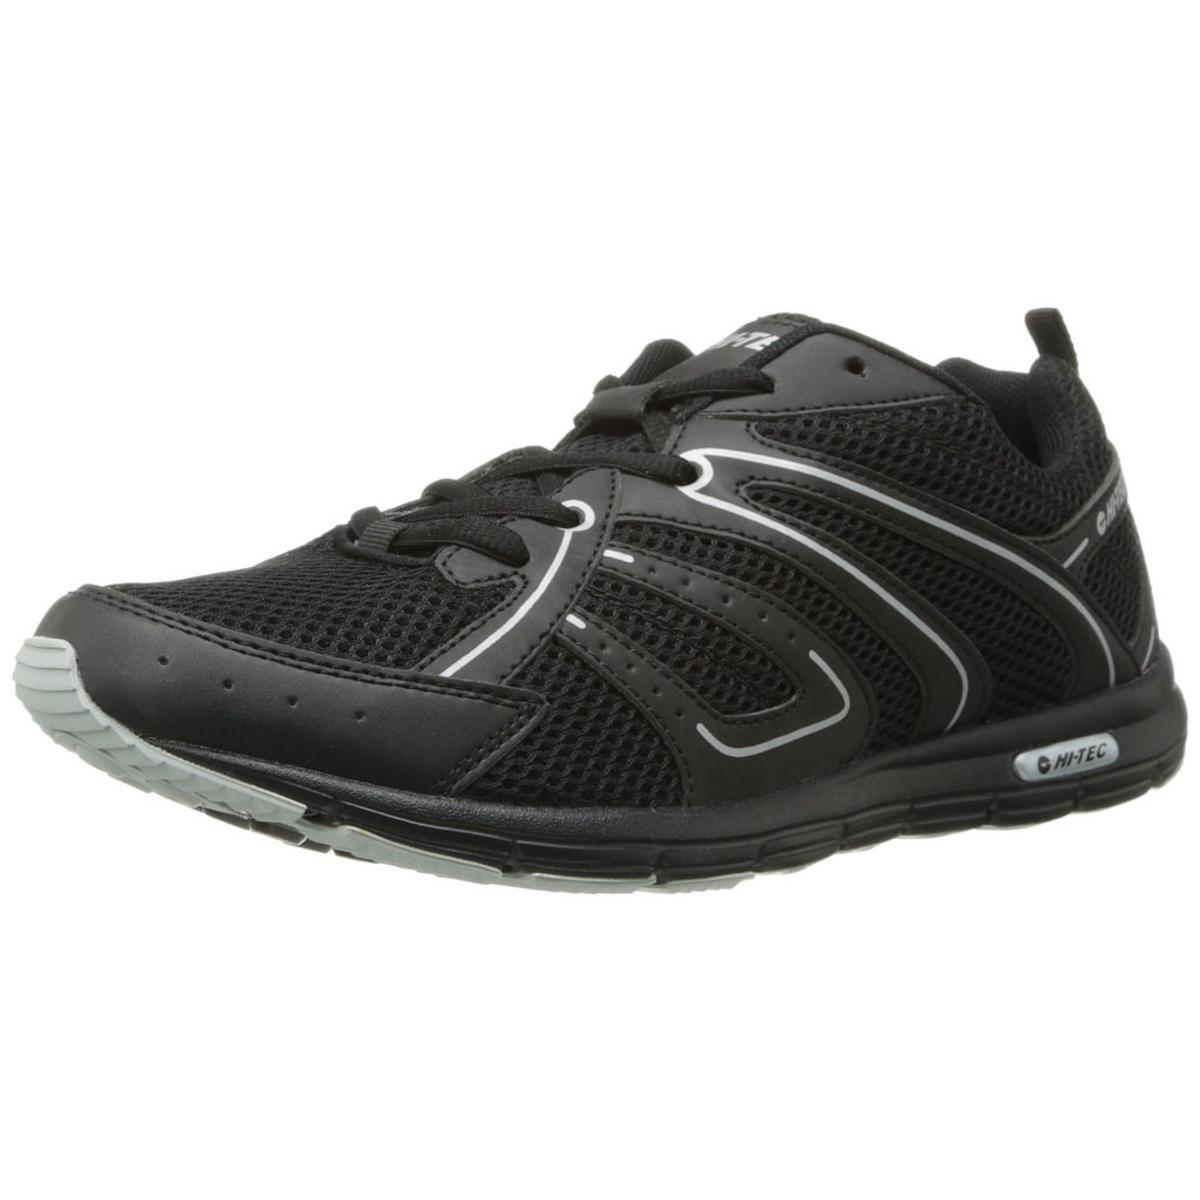 Click here to buy Hi-Tec Darwen Mens Black Silver Sneakers by Hi-Tec.